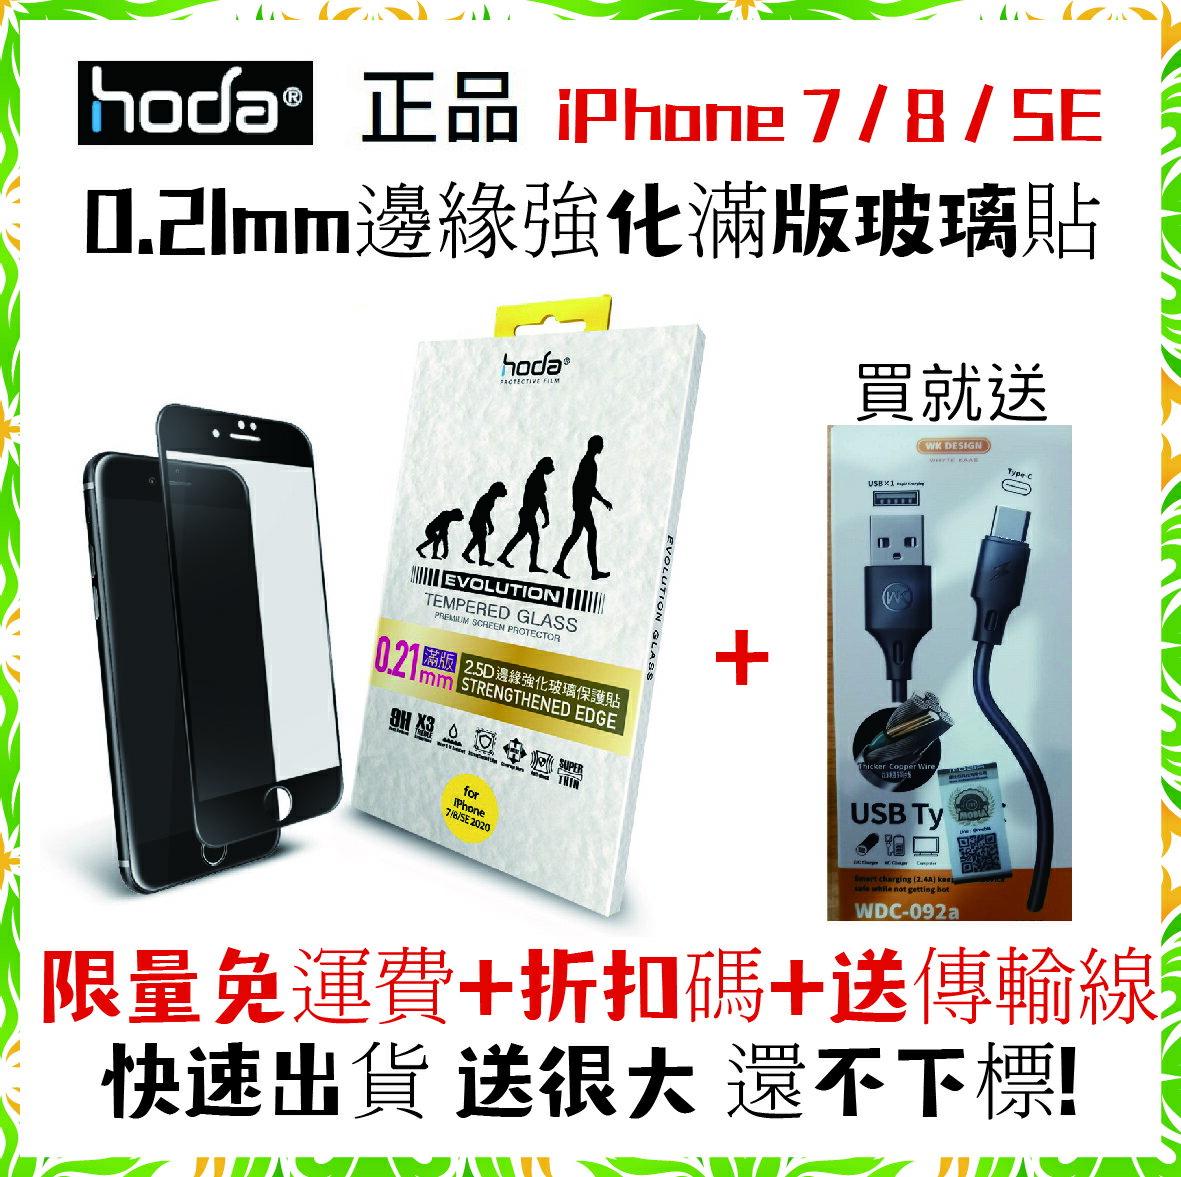 hoda iPhone 7/8/SE 2020 4.7吋 2.5D邊緣強化滿版9H鋼化玻璃保護貼 0.21mm 送傳輸線